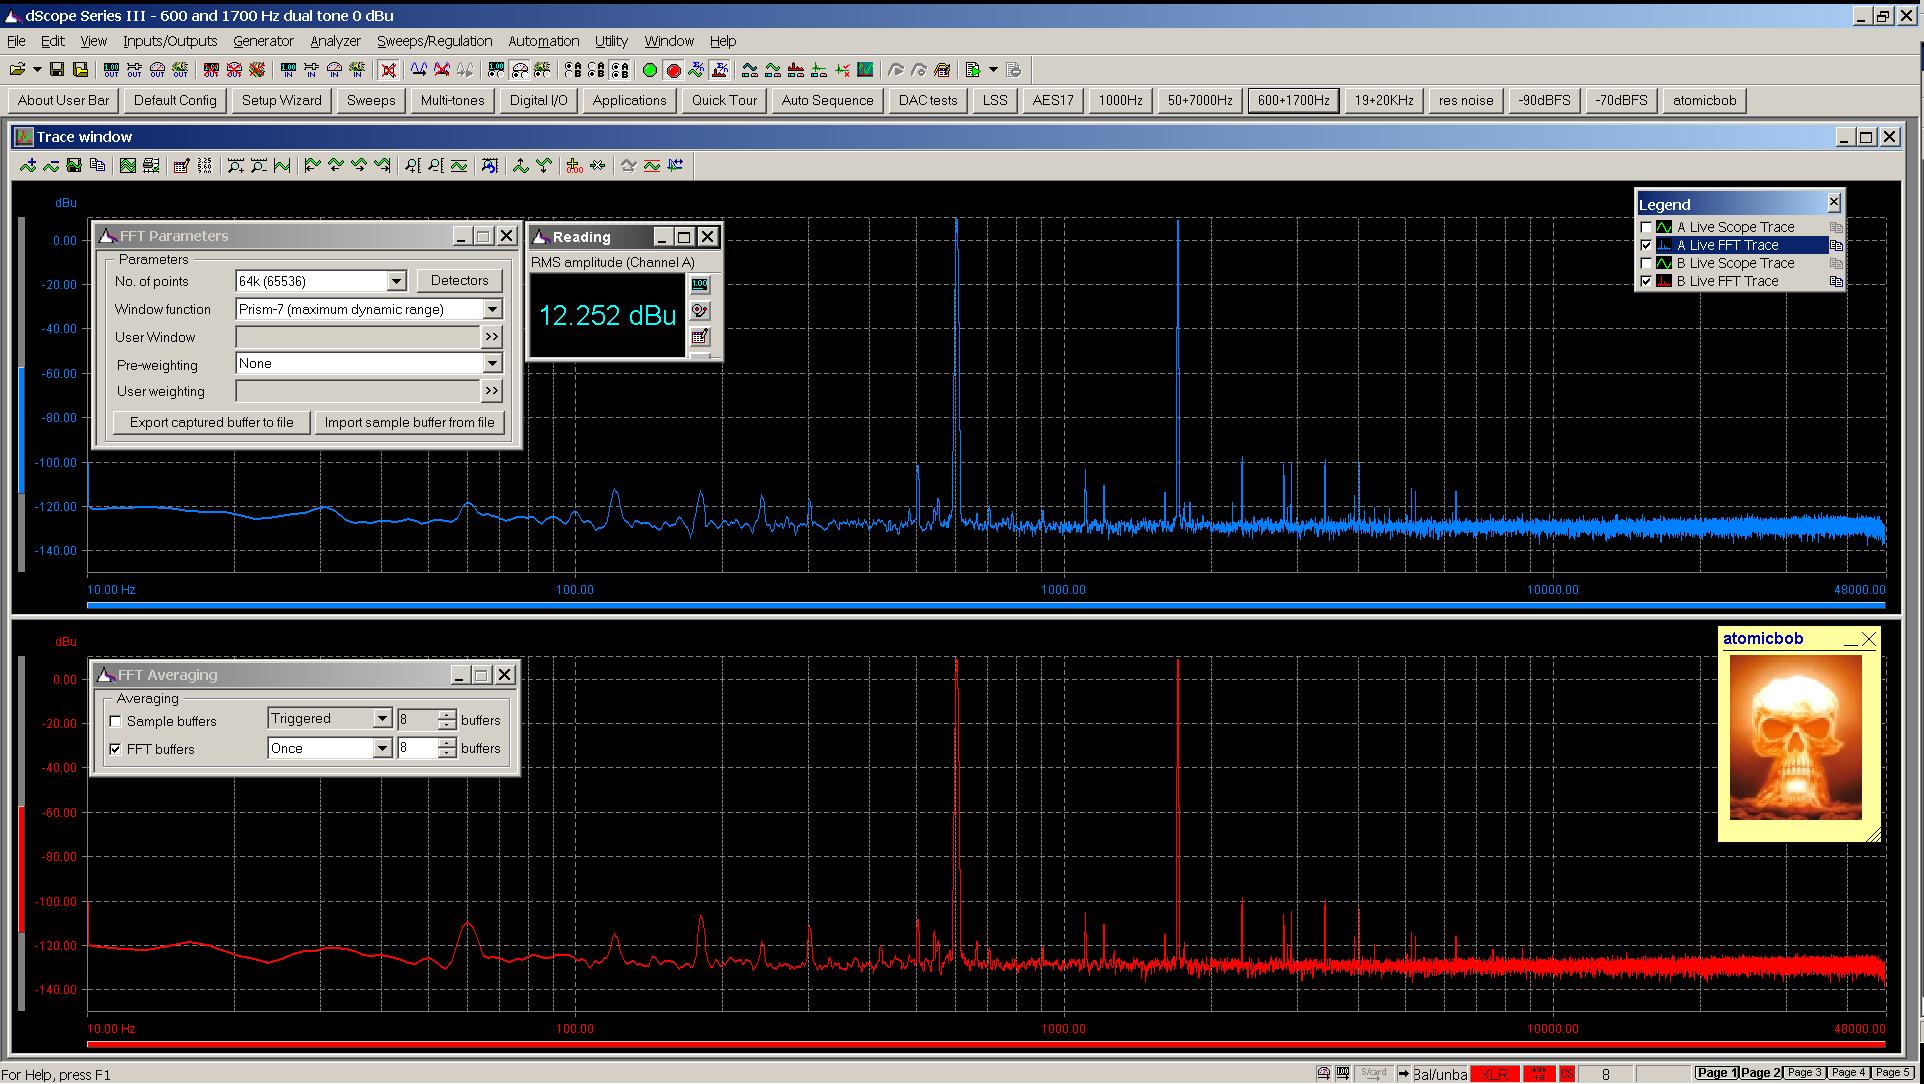 20190323-17 solaris Bal 600+1700Hz dual tone - AES.png